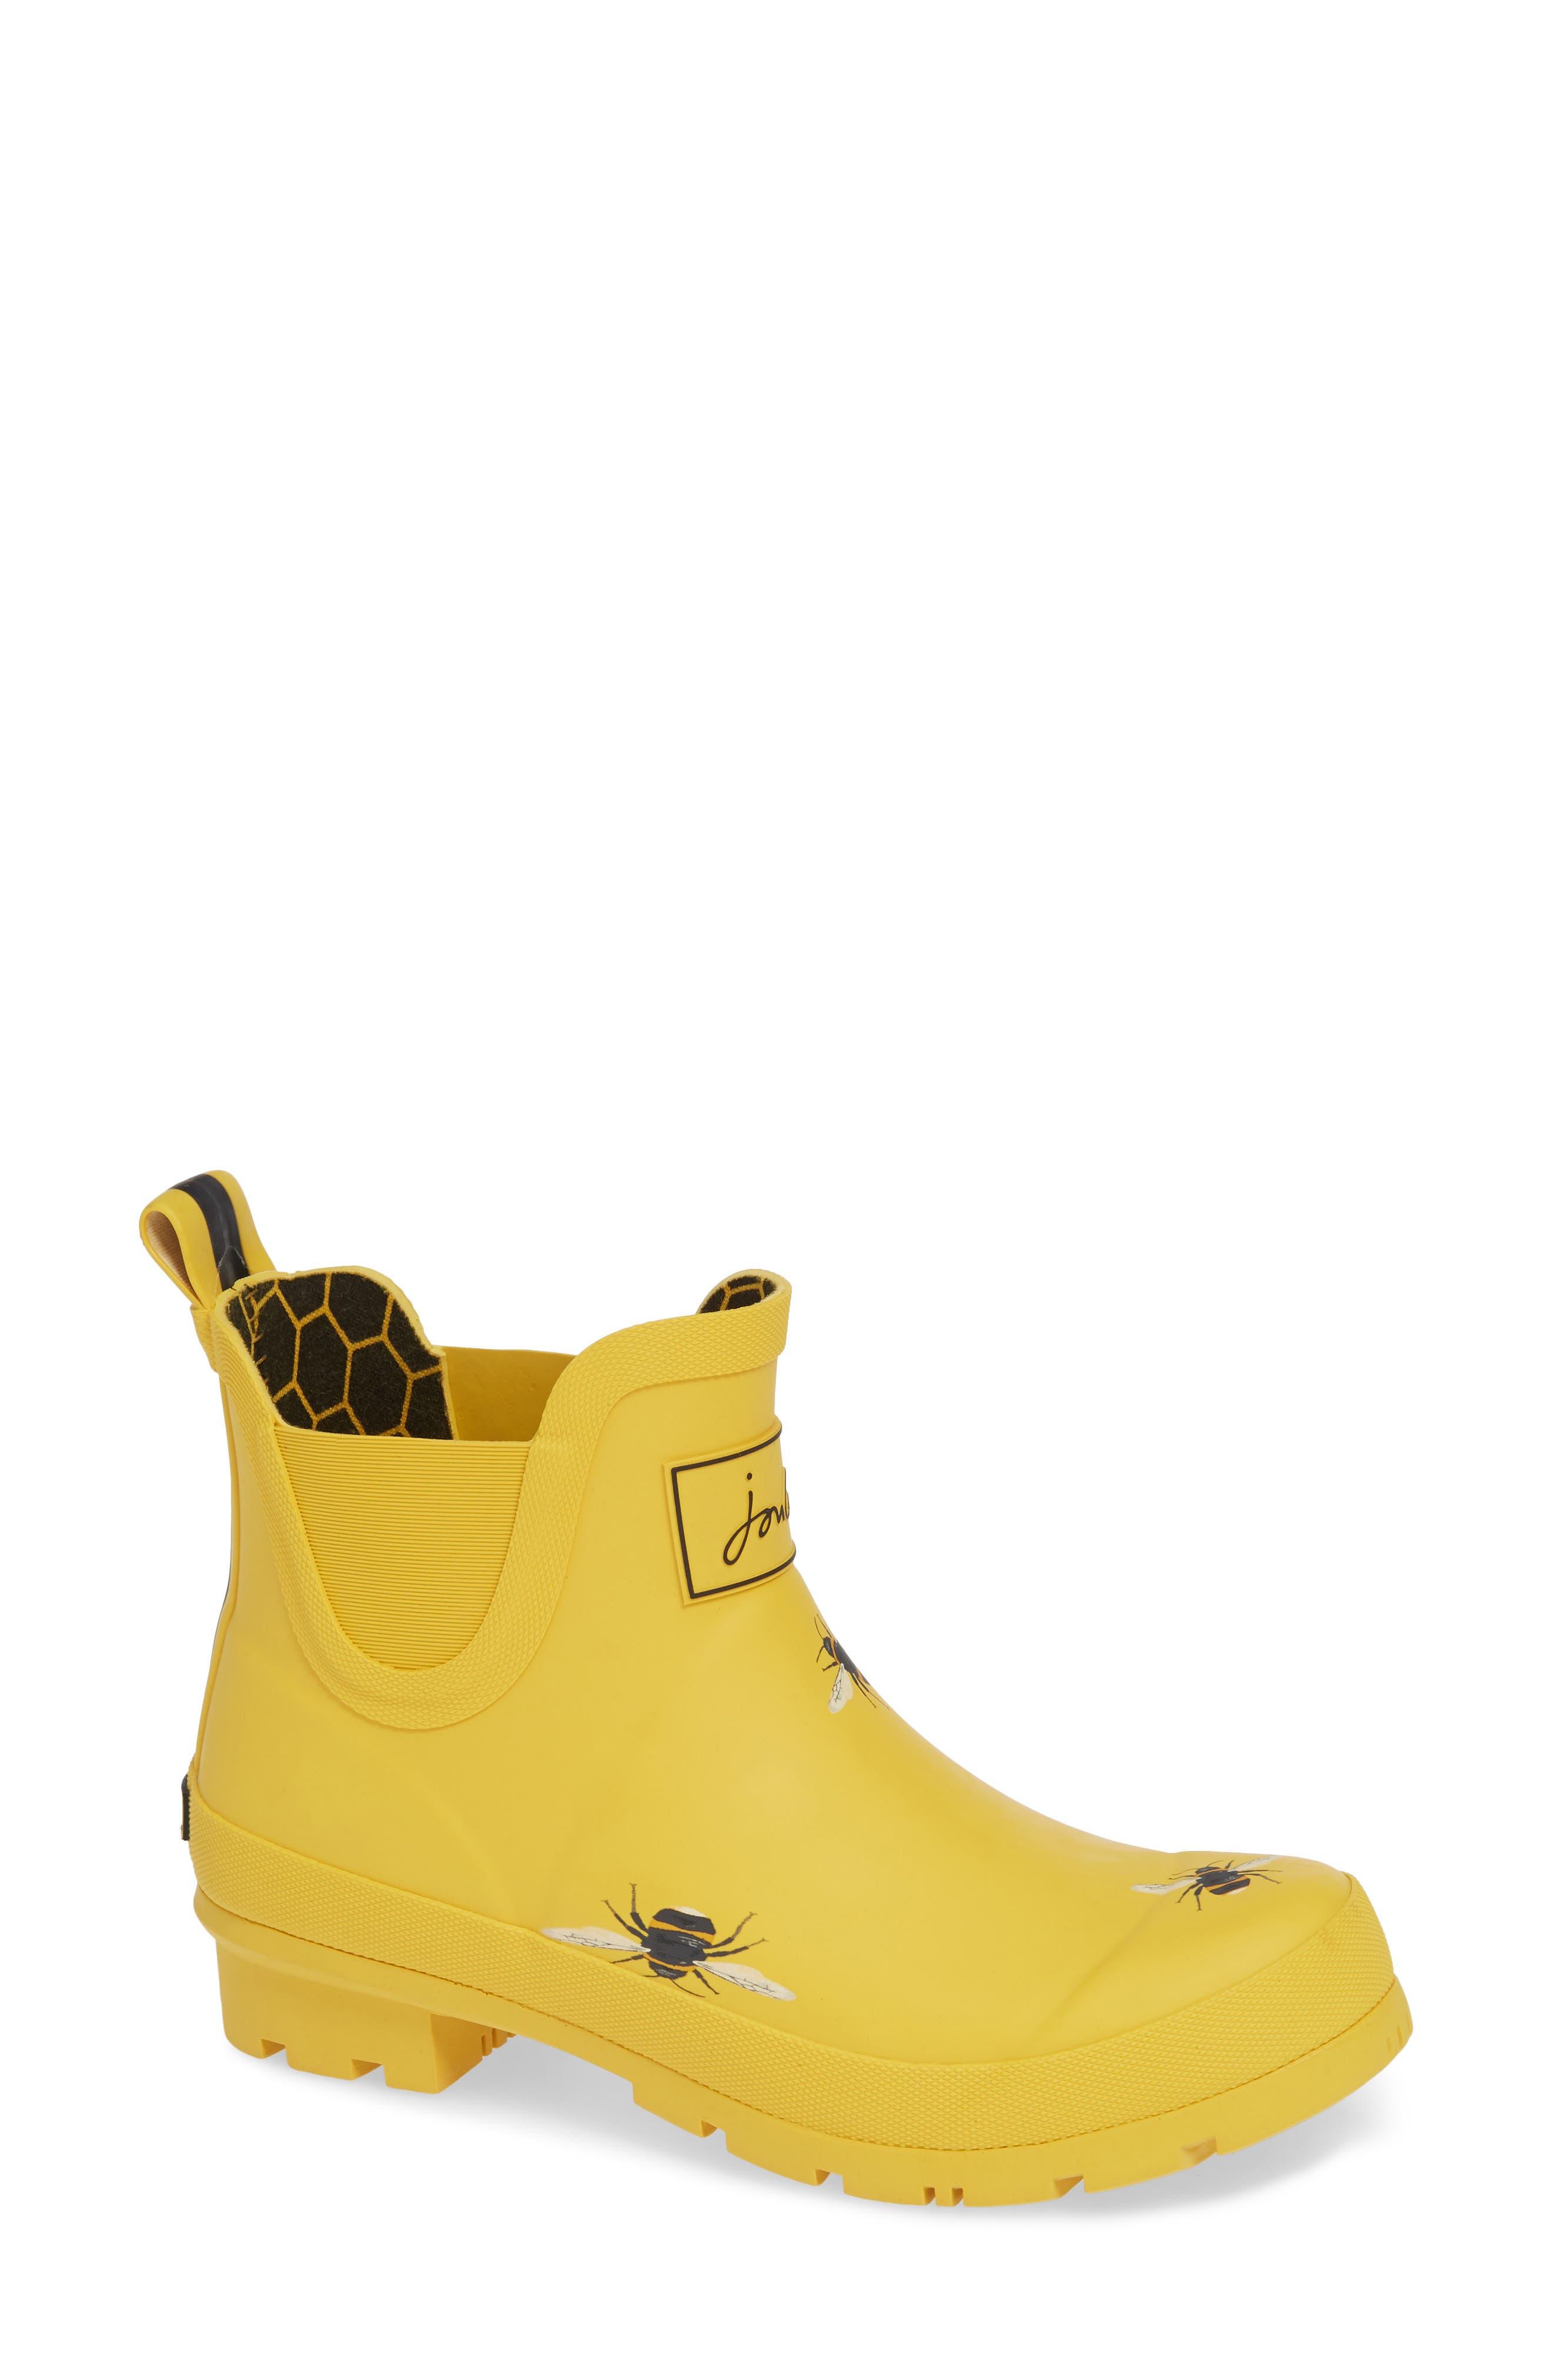 Wellibob Short Rain Boot,                         Main,                         color, GOLD BOTANICAL BEES